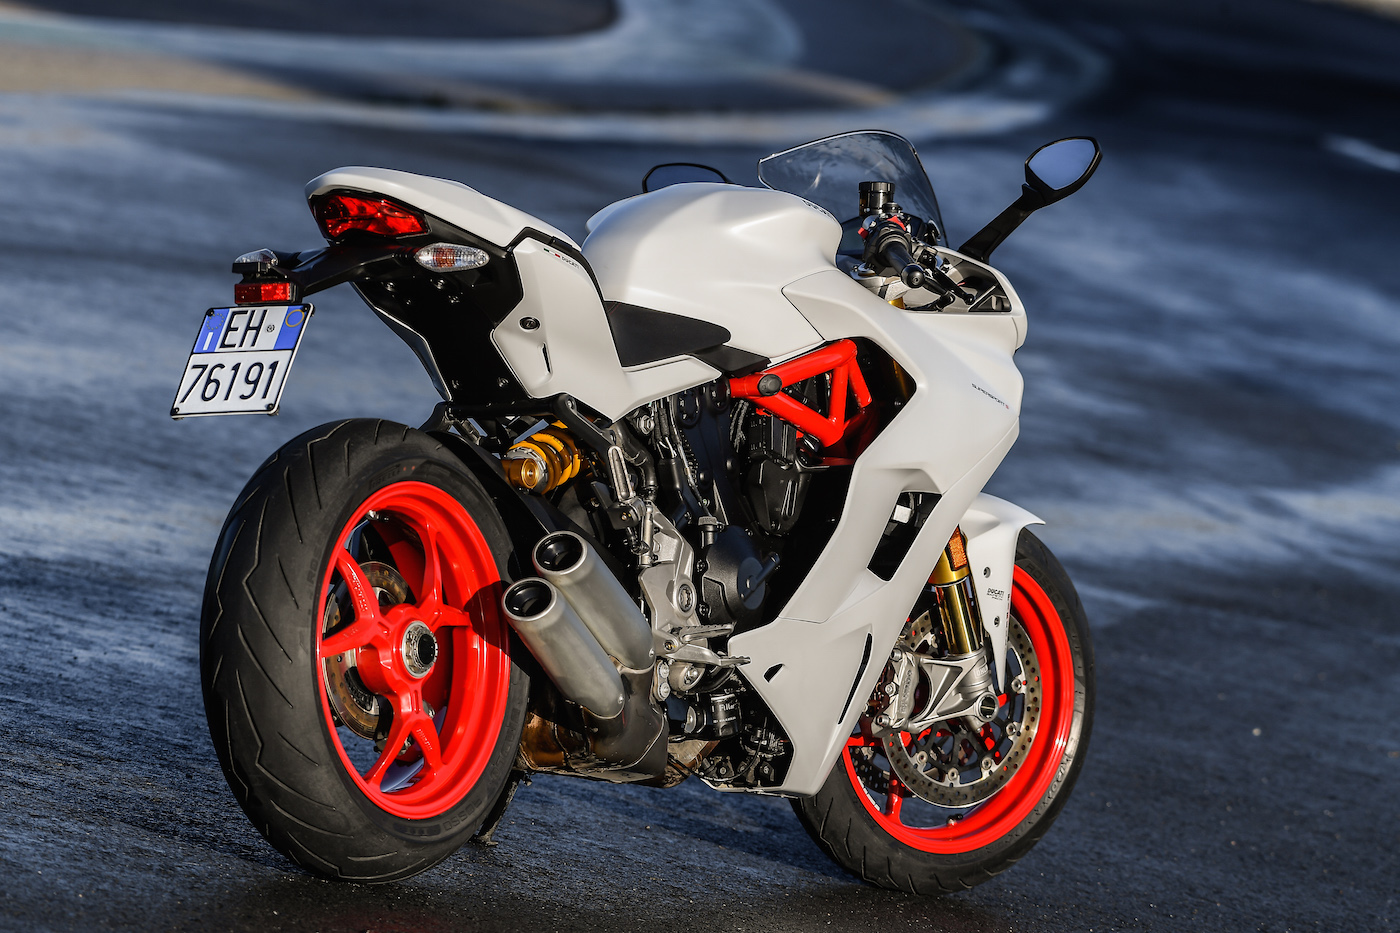 Ducati_Supersport_S_smallstatic2